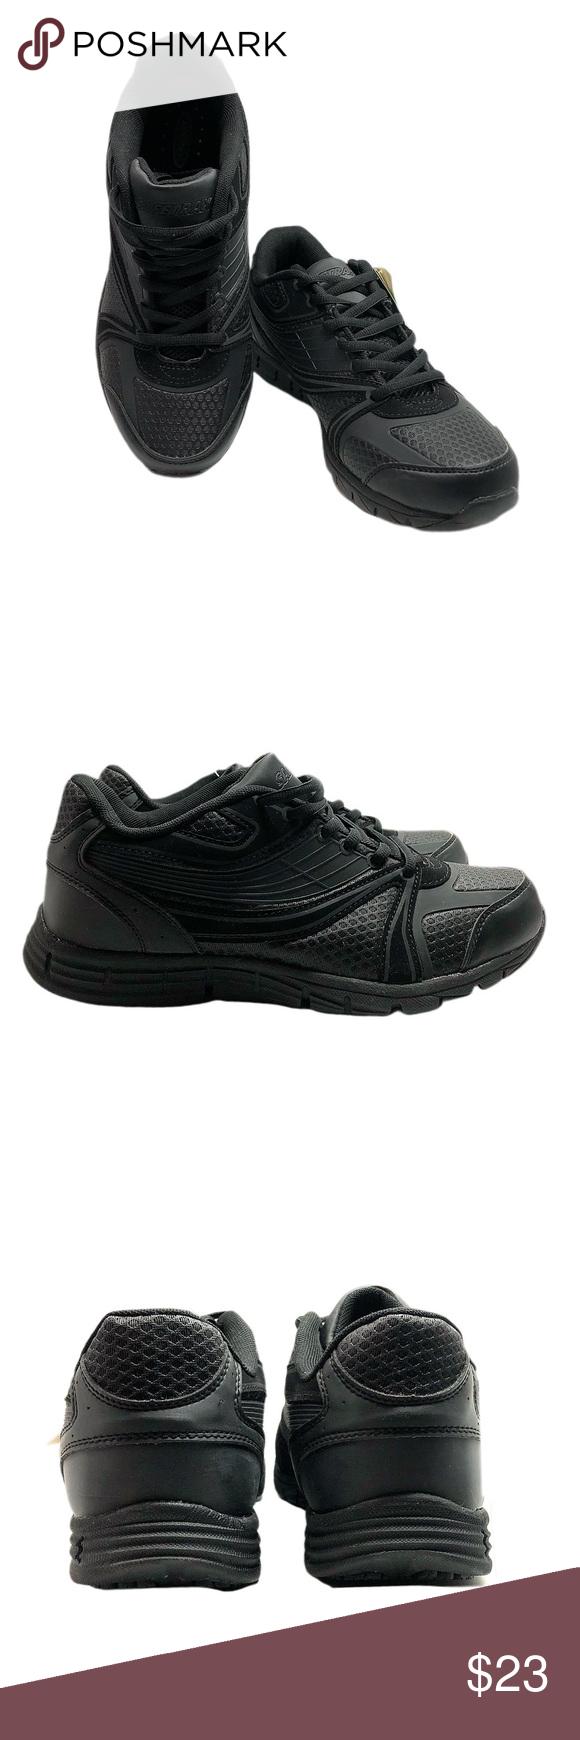 Safetrax Non-Slip Work Shoe Sneaker